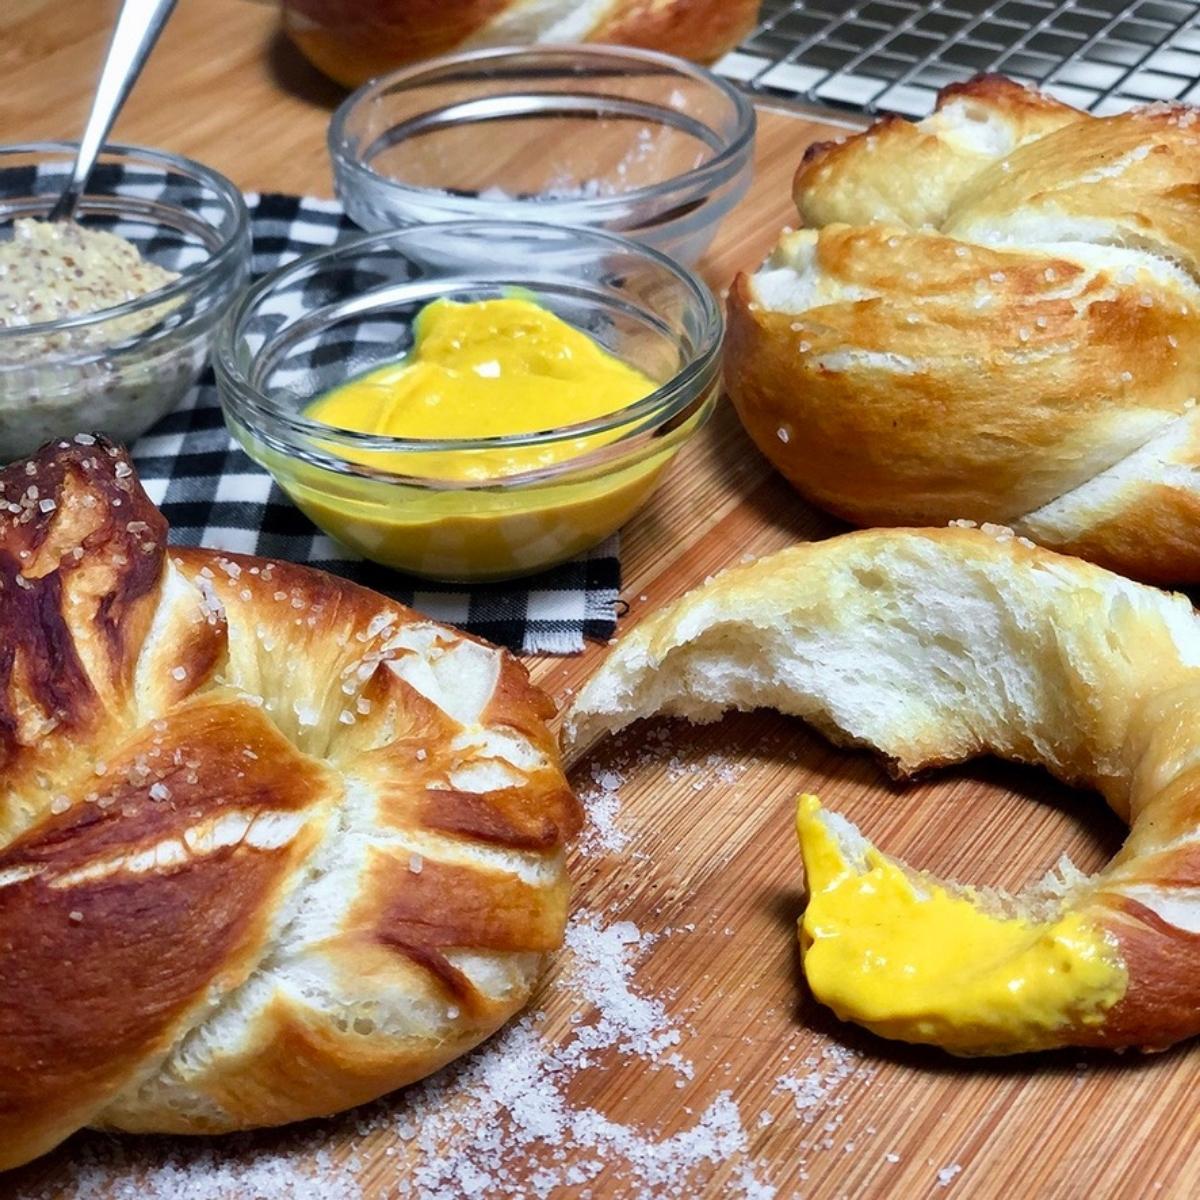 Best Vegan Homemade Soft Pretzels with mustard and salt on a cutting board.